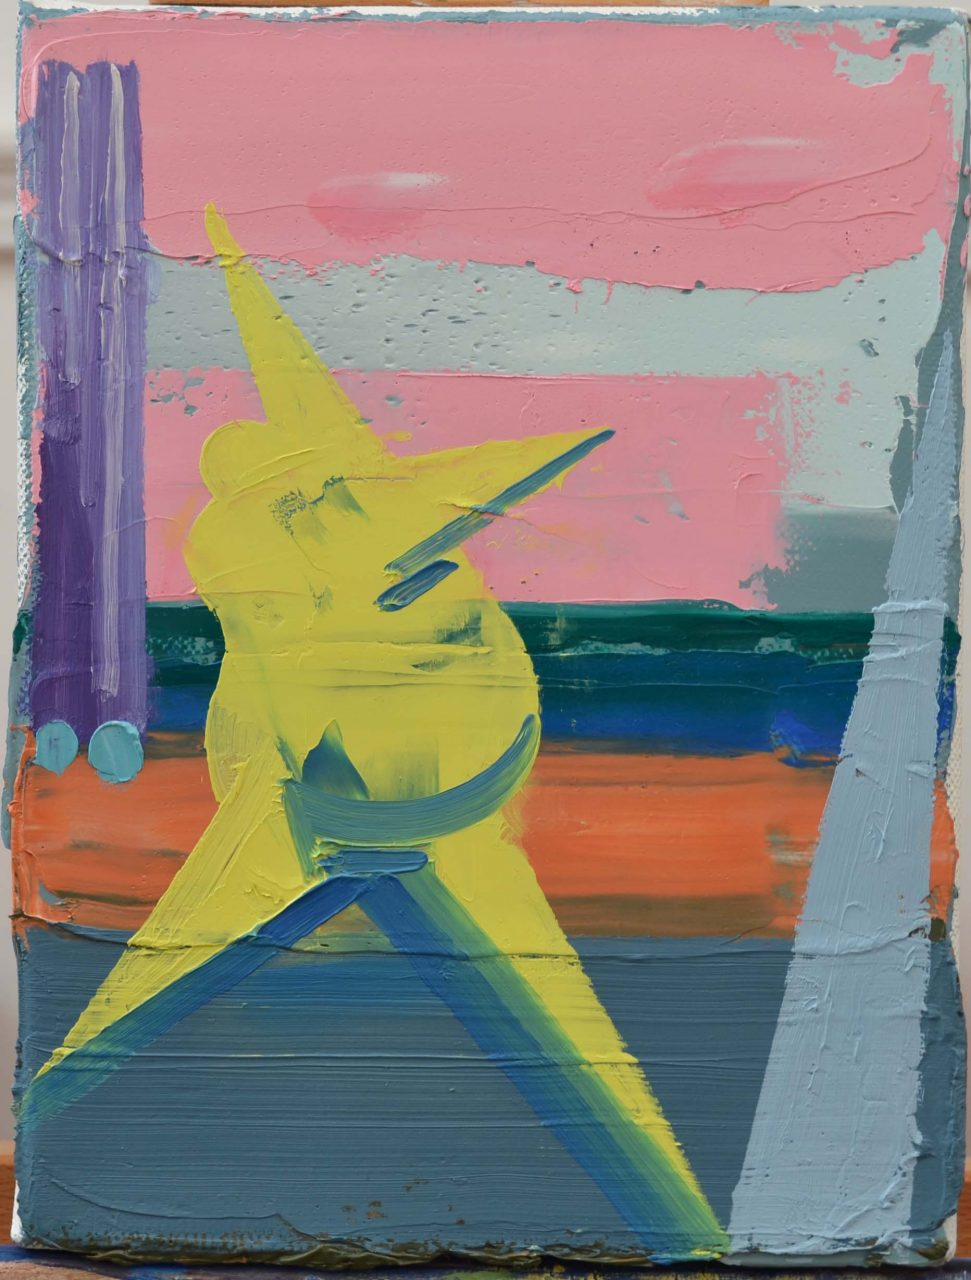 Star, 2017. Oil on canvas, 18x24cm